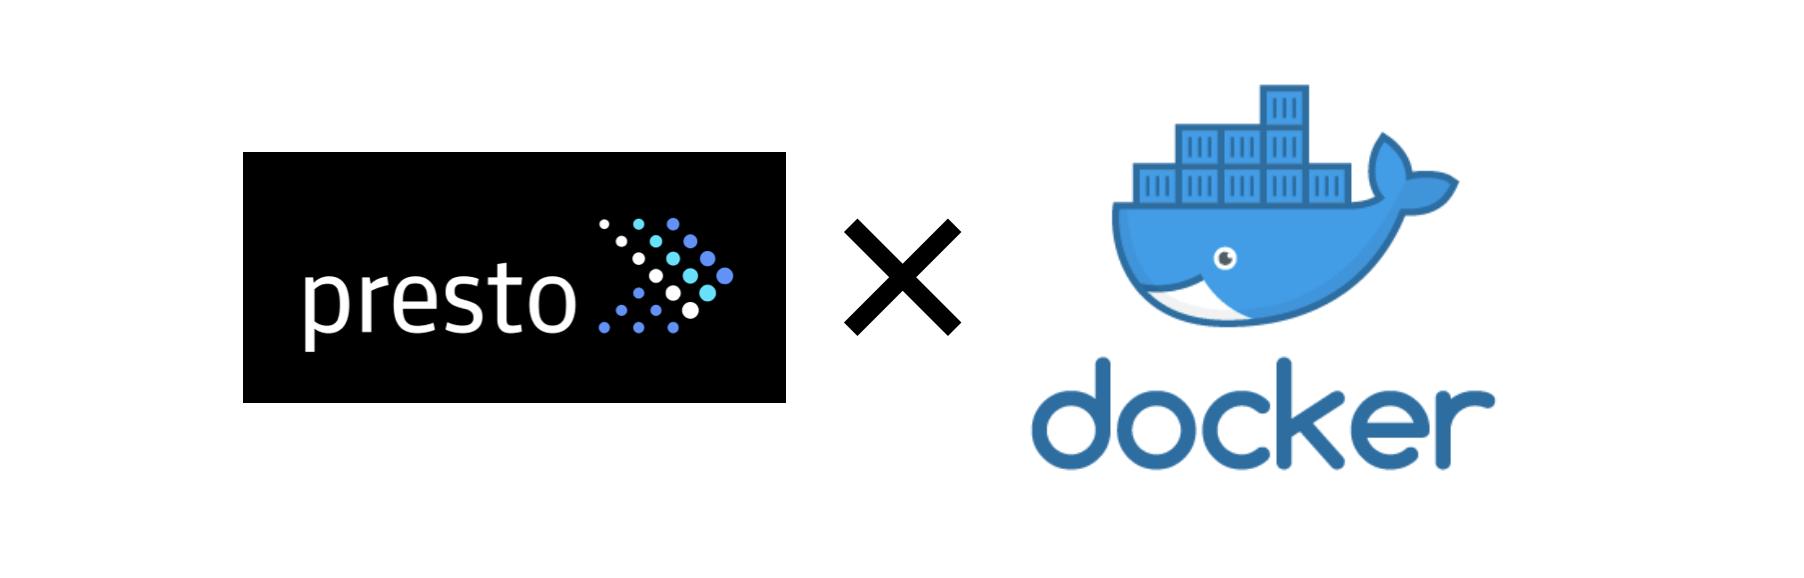 Run queries in your local Presto cluster on Docker